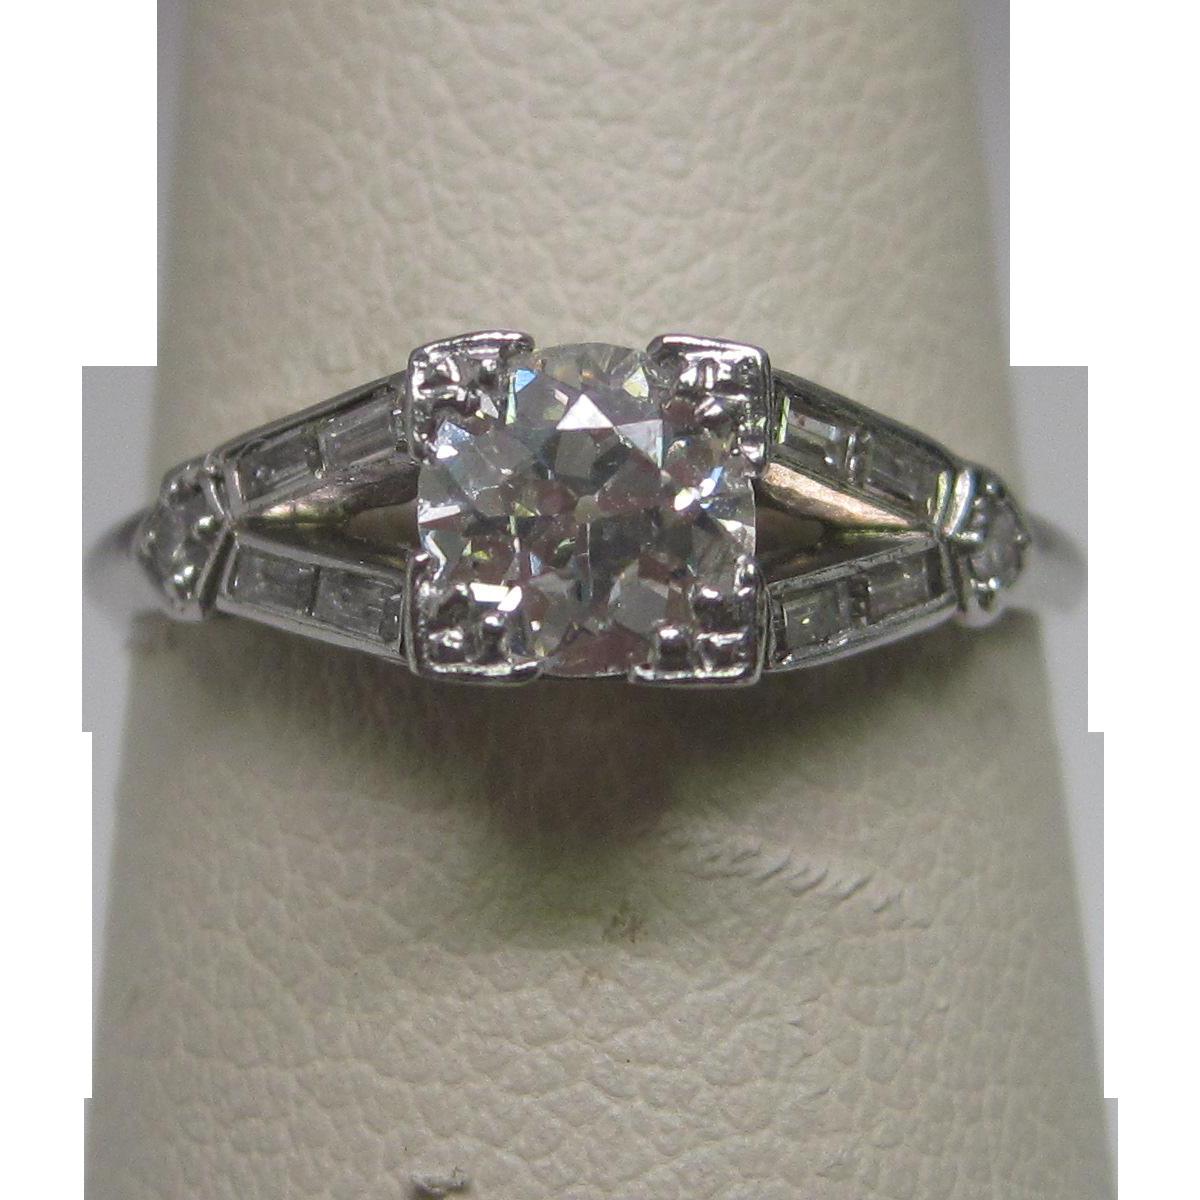 Art Deco 0.55 ct. Diamond Mine Mine Cut and Baguette in Platinum Engagement Ring